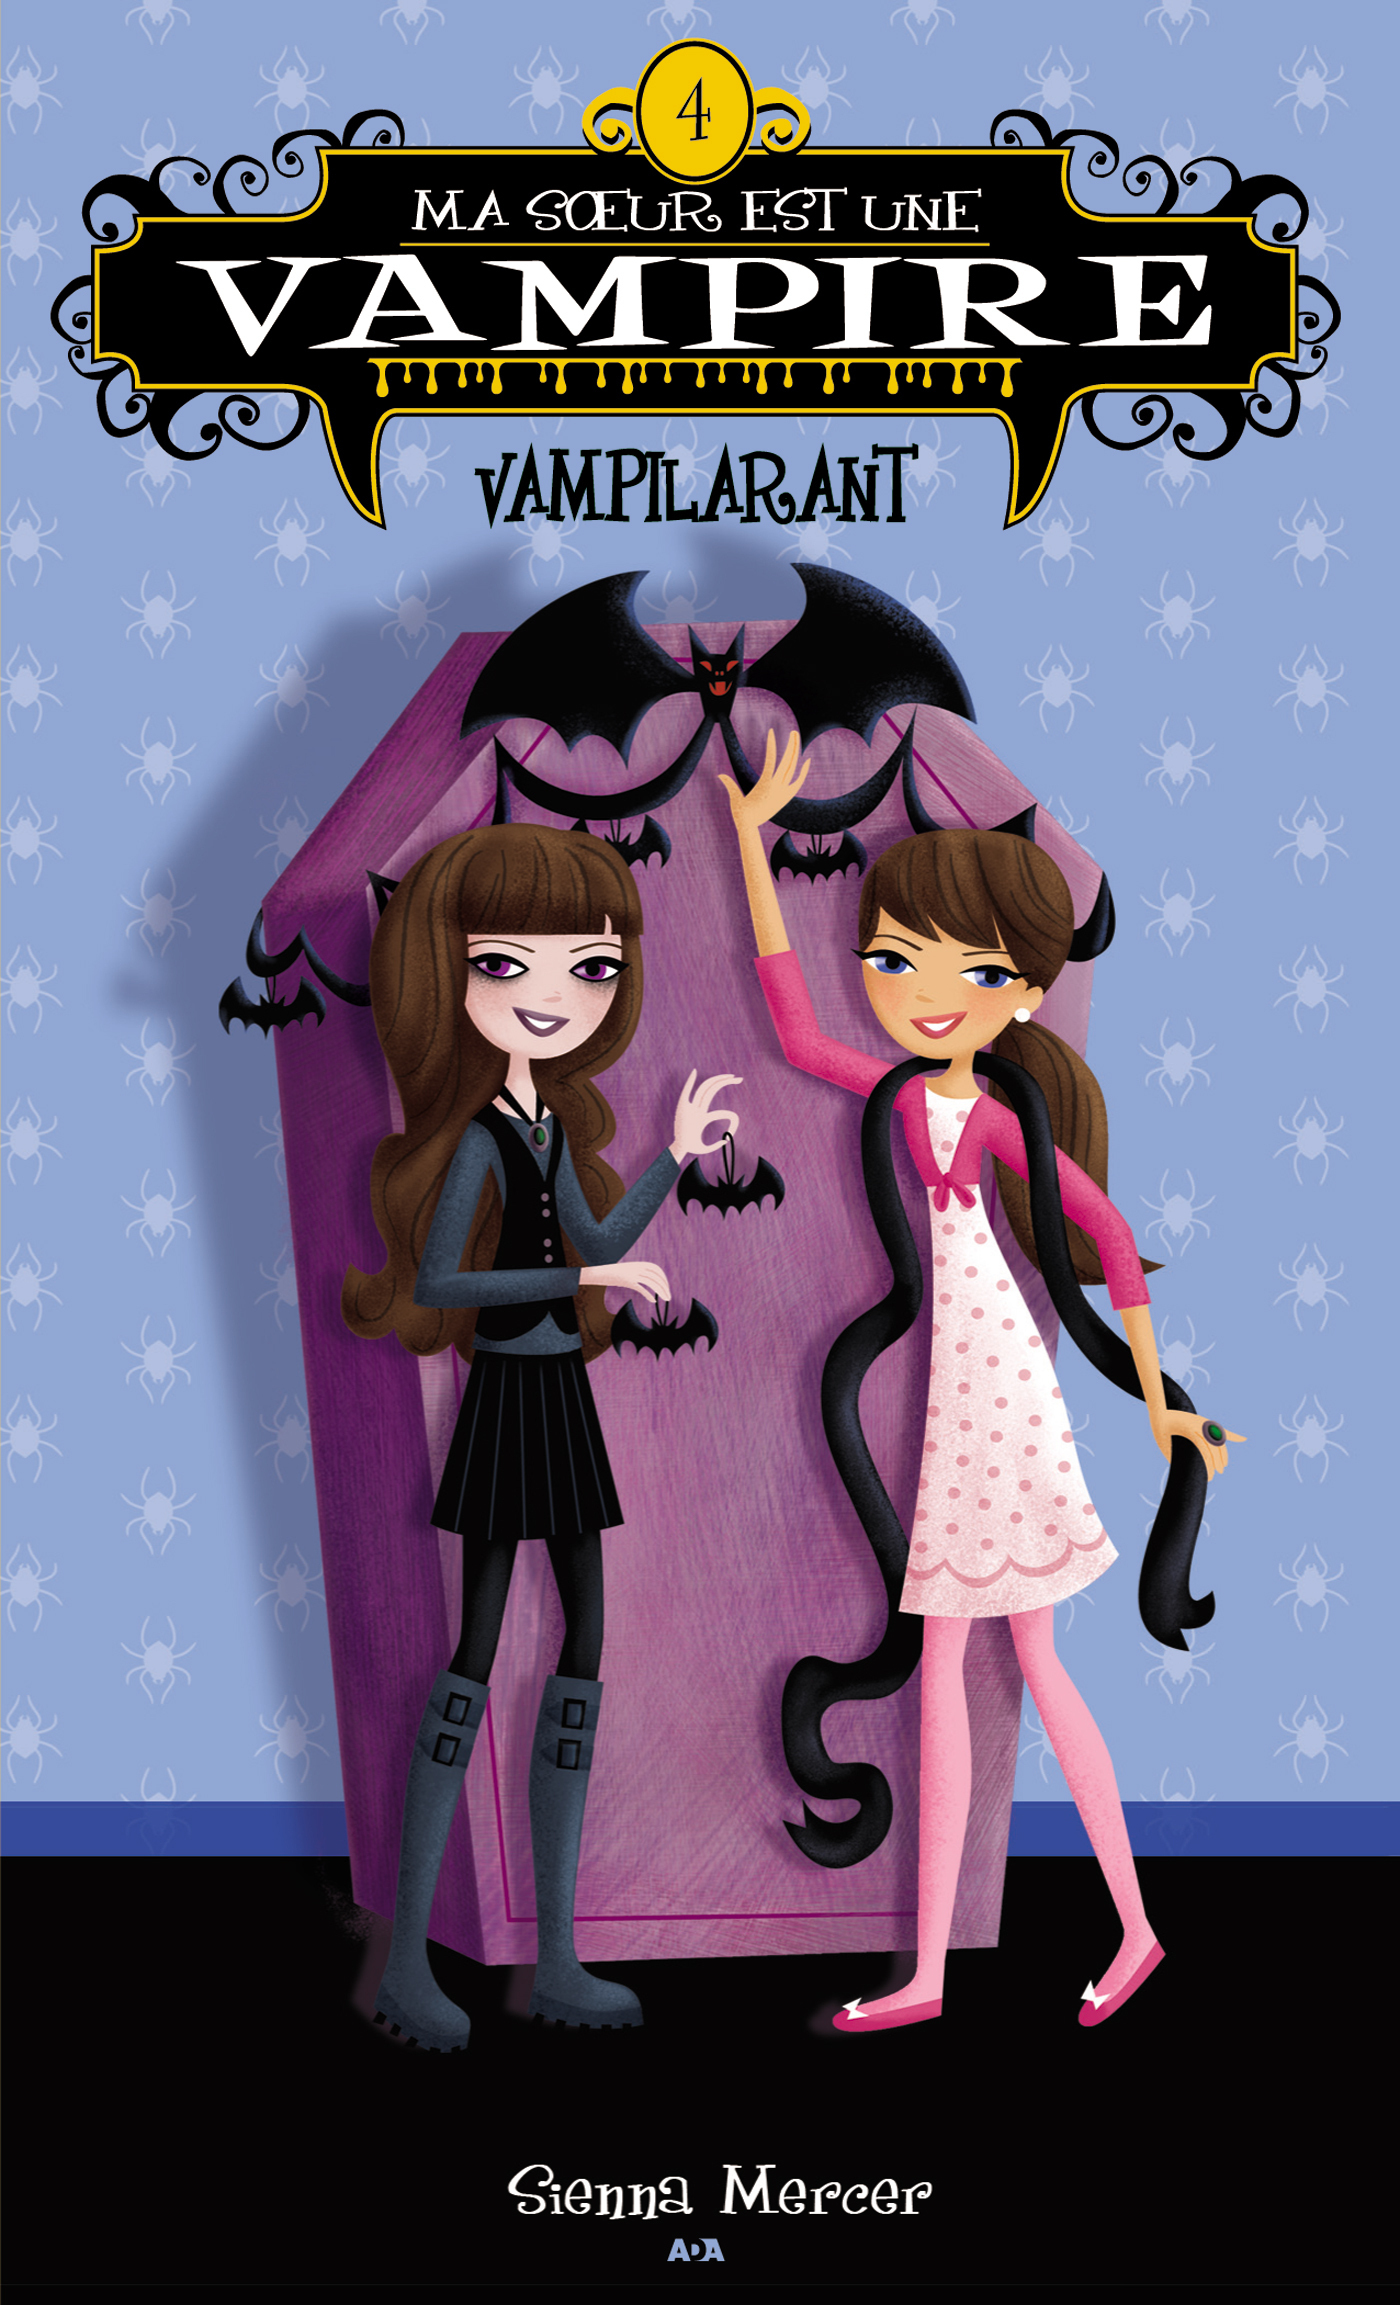 Ma soeur est une vampire